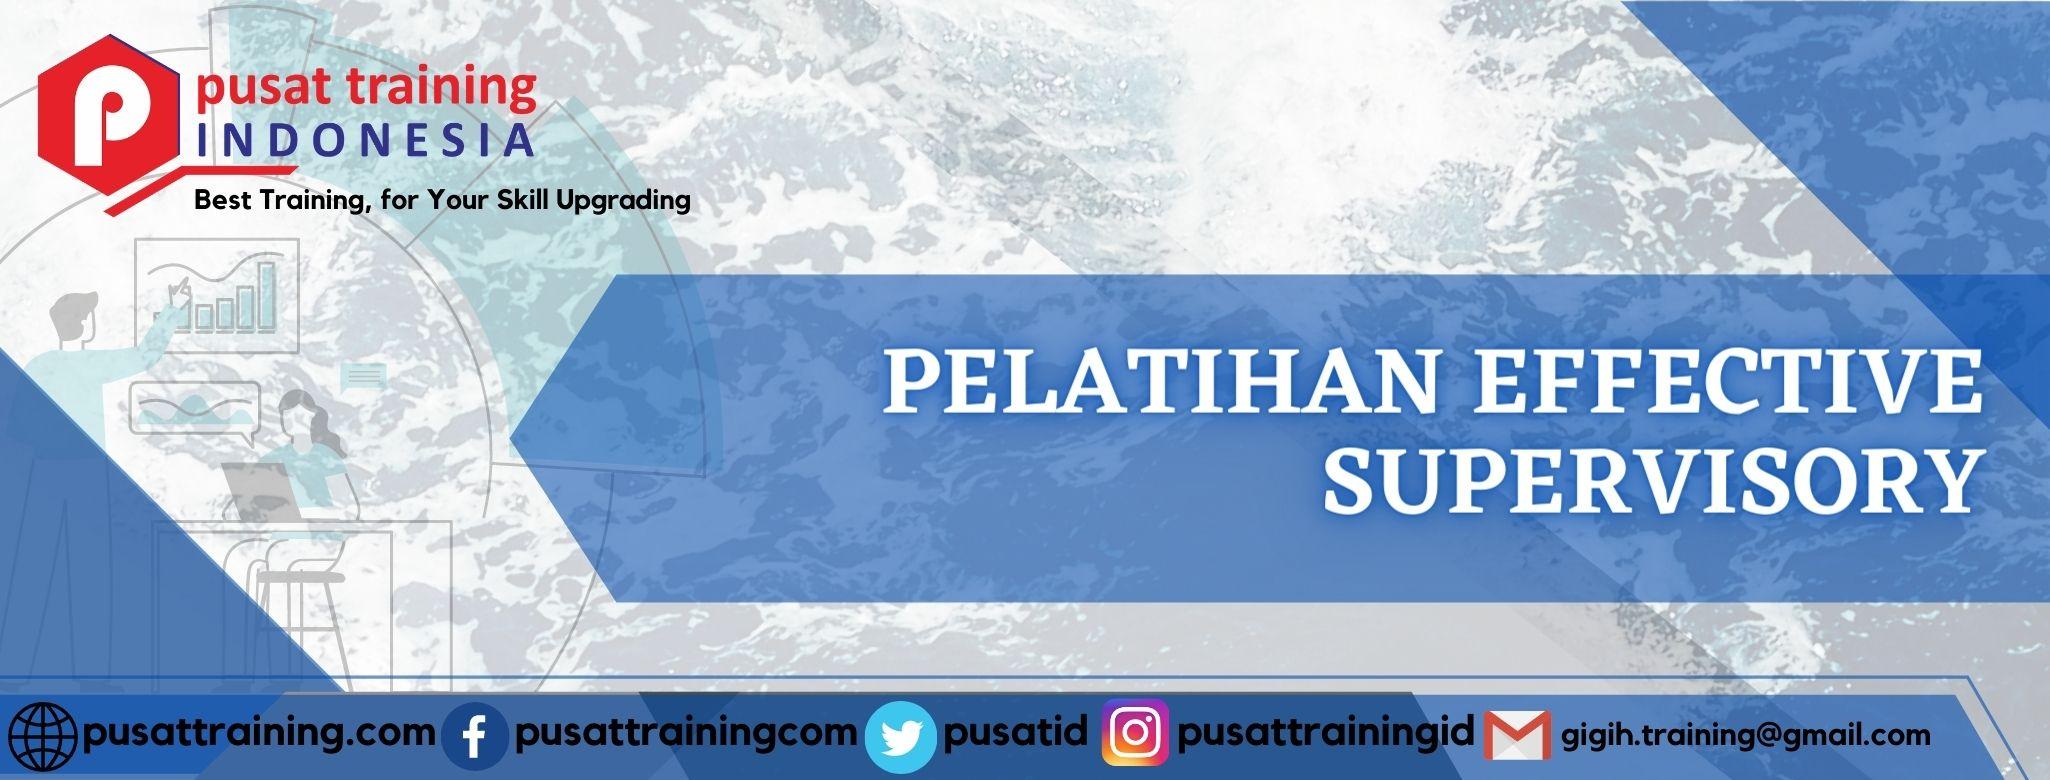 pelatihan-effective-supervisory